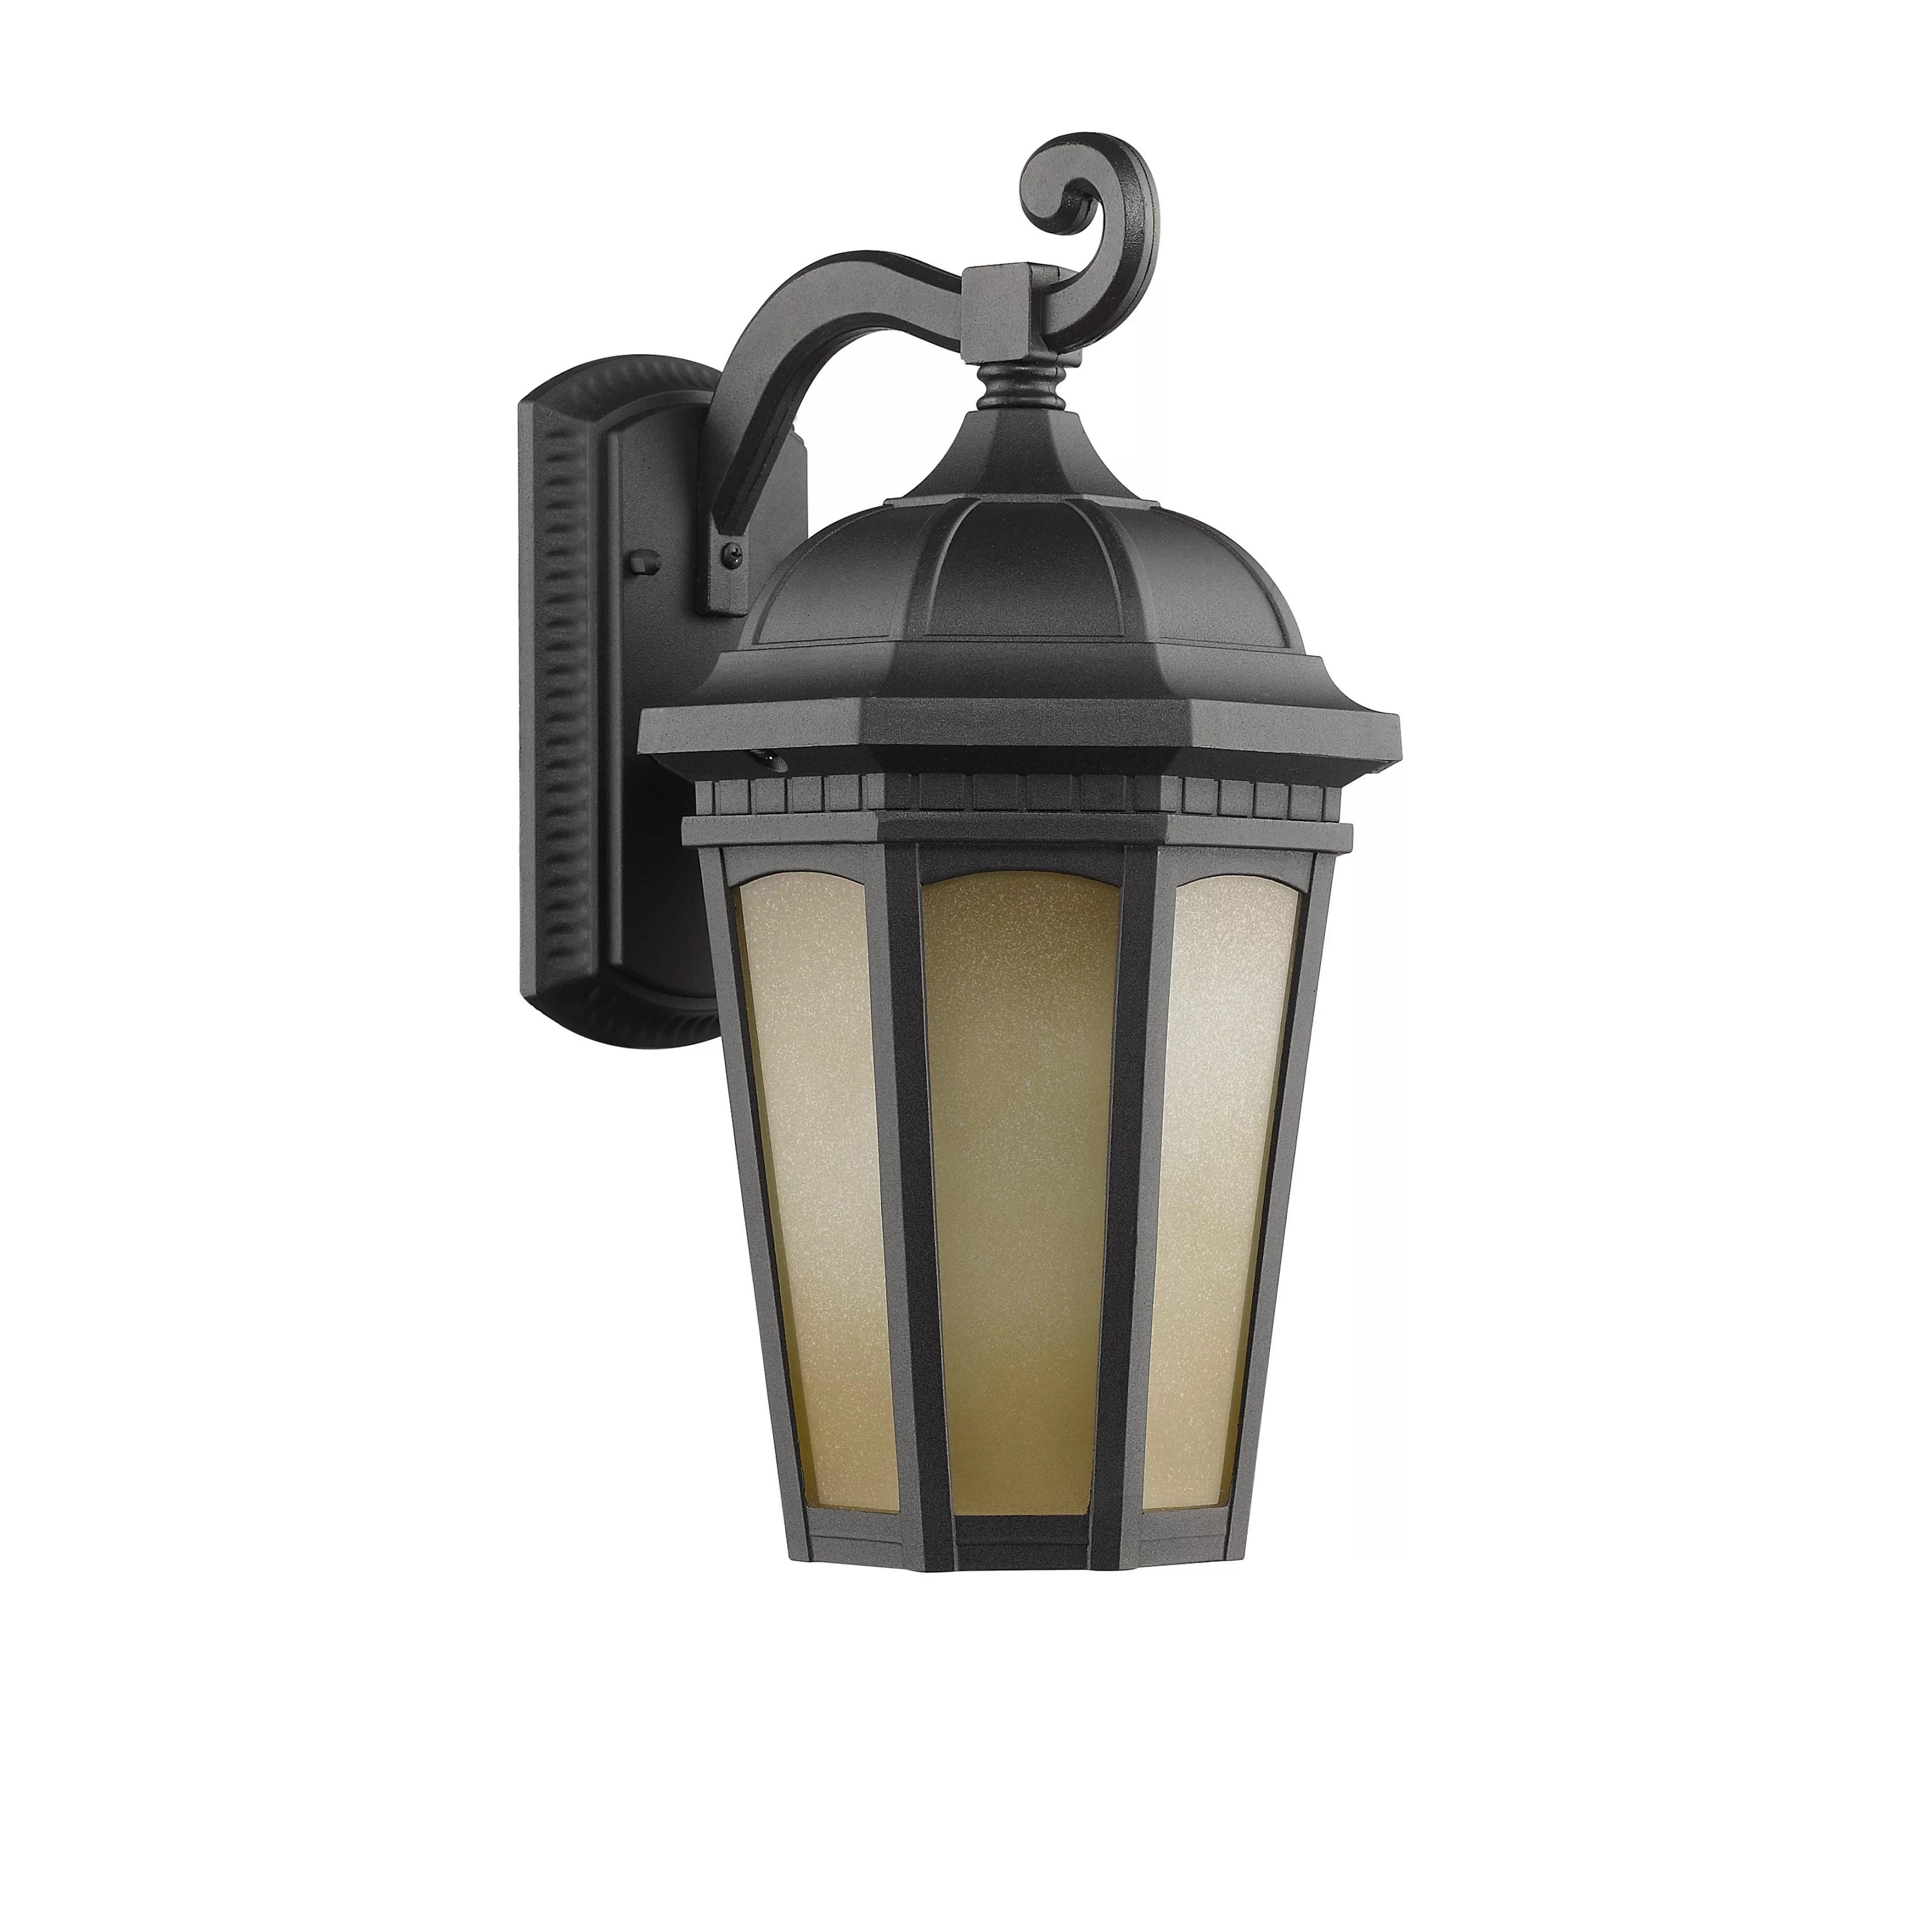 Telsa 1 Light Transitional Outdoor Wall Sconce | Wayfair on Sconce Outdoor Lighting id=30771